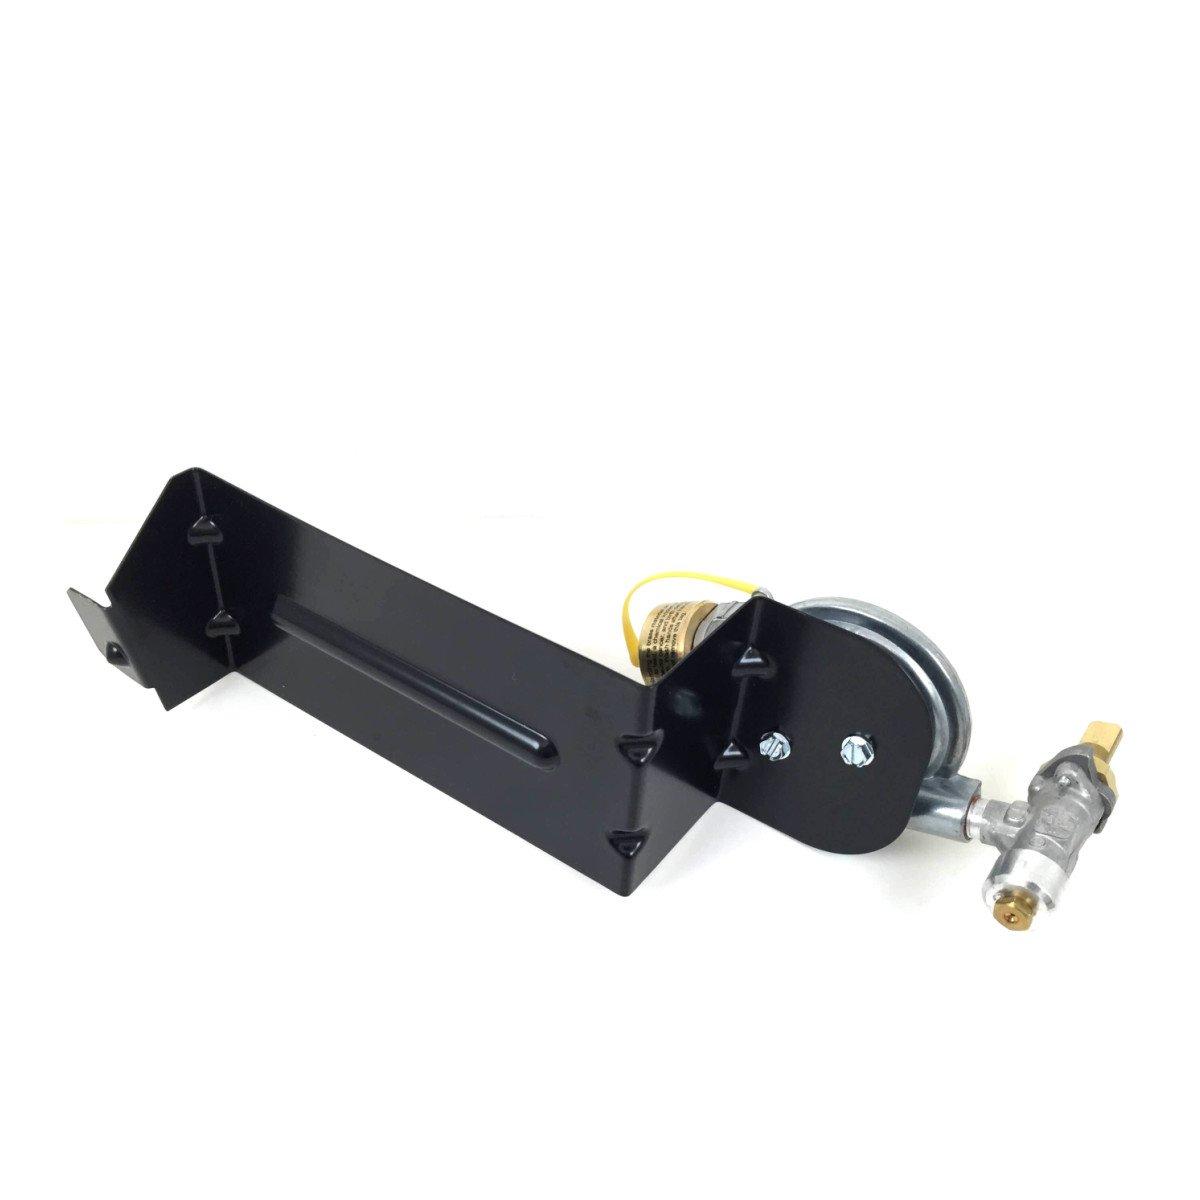 Weber Gas Grill Q220 Replacement Valve Regulator Allis Chalmers 200 Wiring Diagram Manifold 80476 Q Parts Garden Outdoor